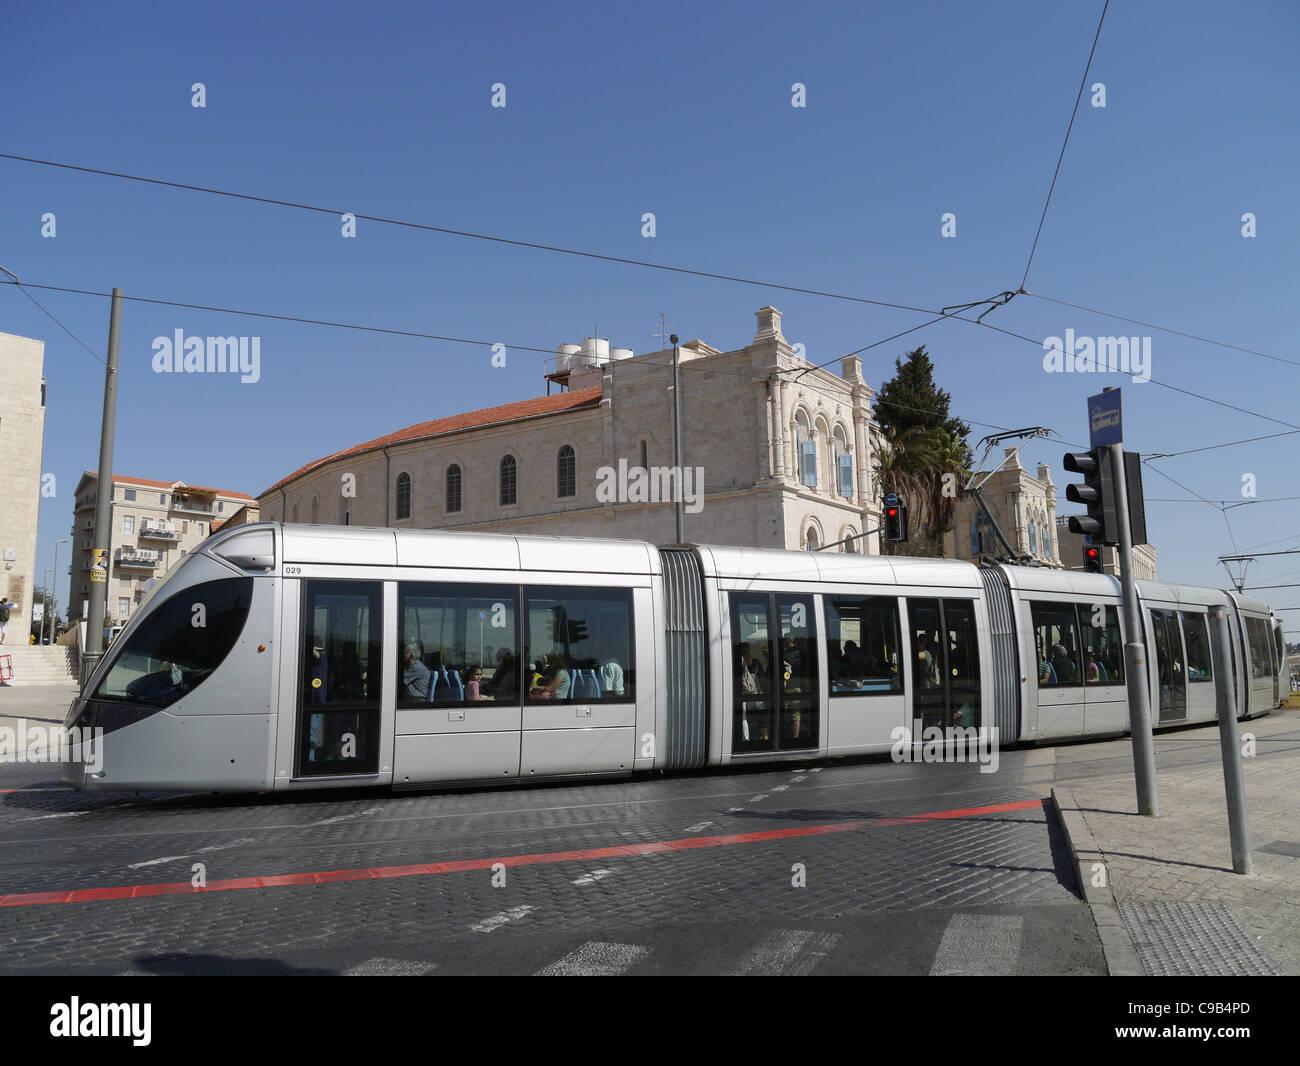 Jerusalem Commuter train on Jaffa Road near Old City - Stock Image